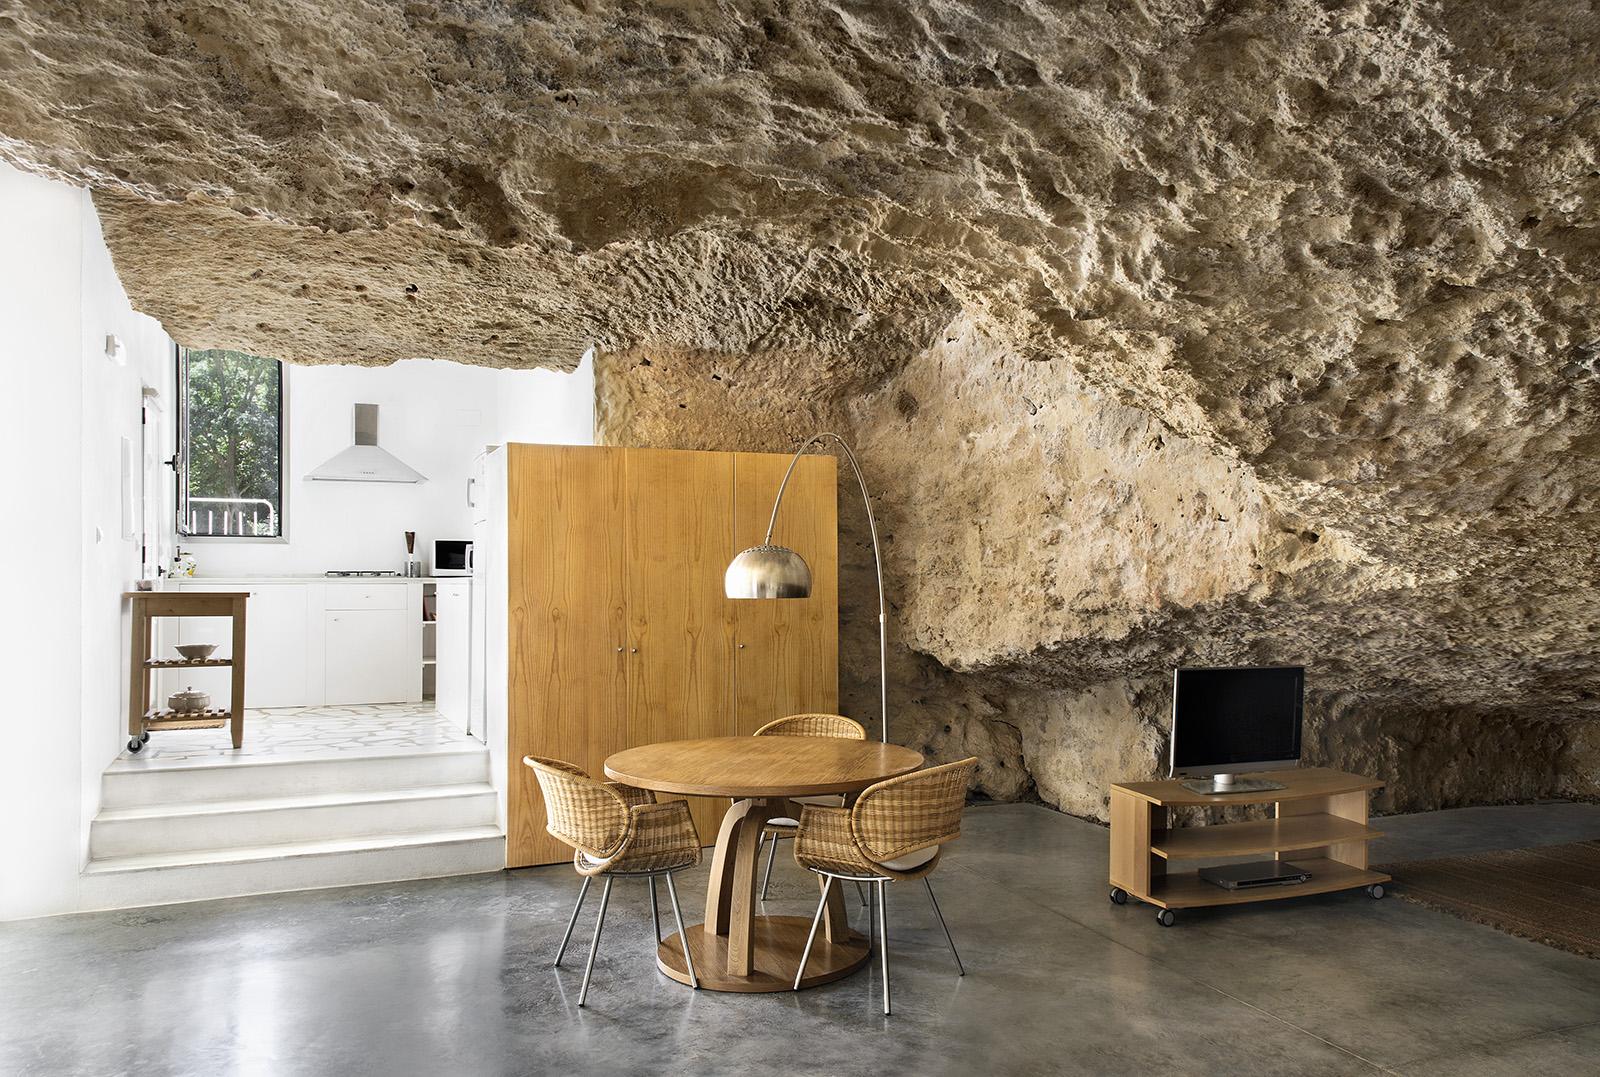 5. Cave House in Villarrubia Córdoba - Casa Tierra: a Cave House in Córdoba by UMMO Estudio